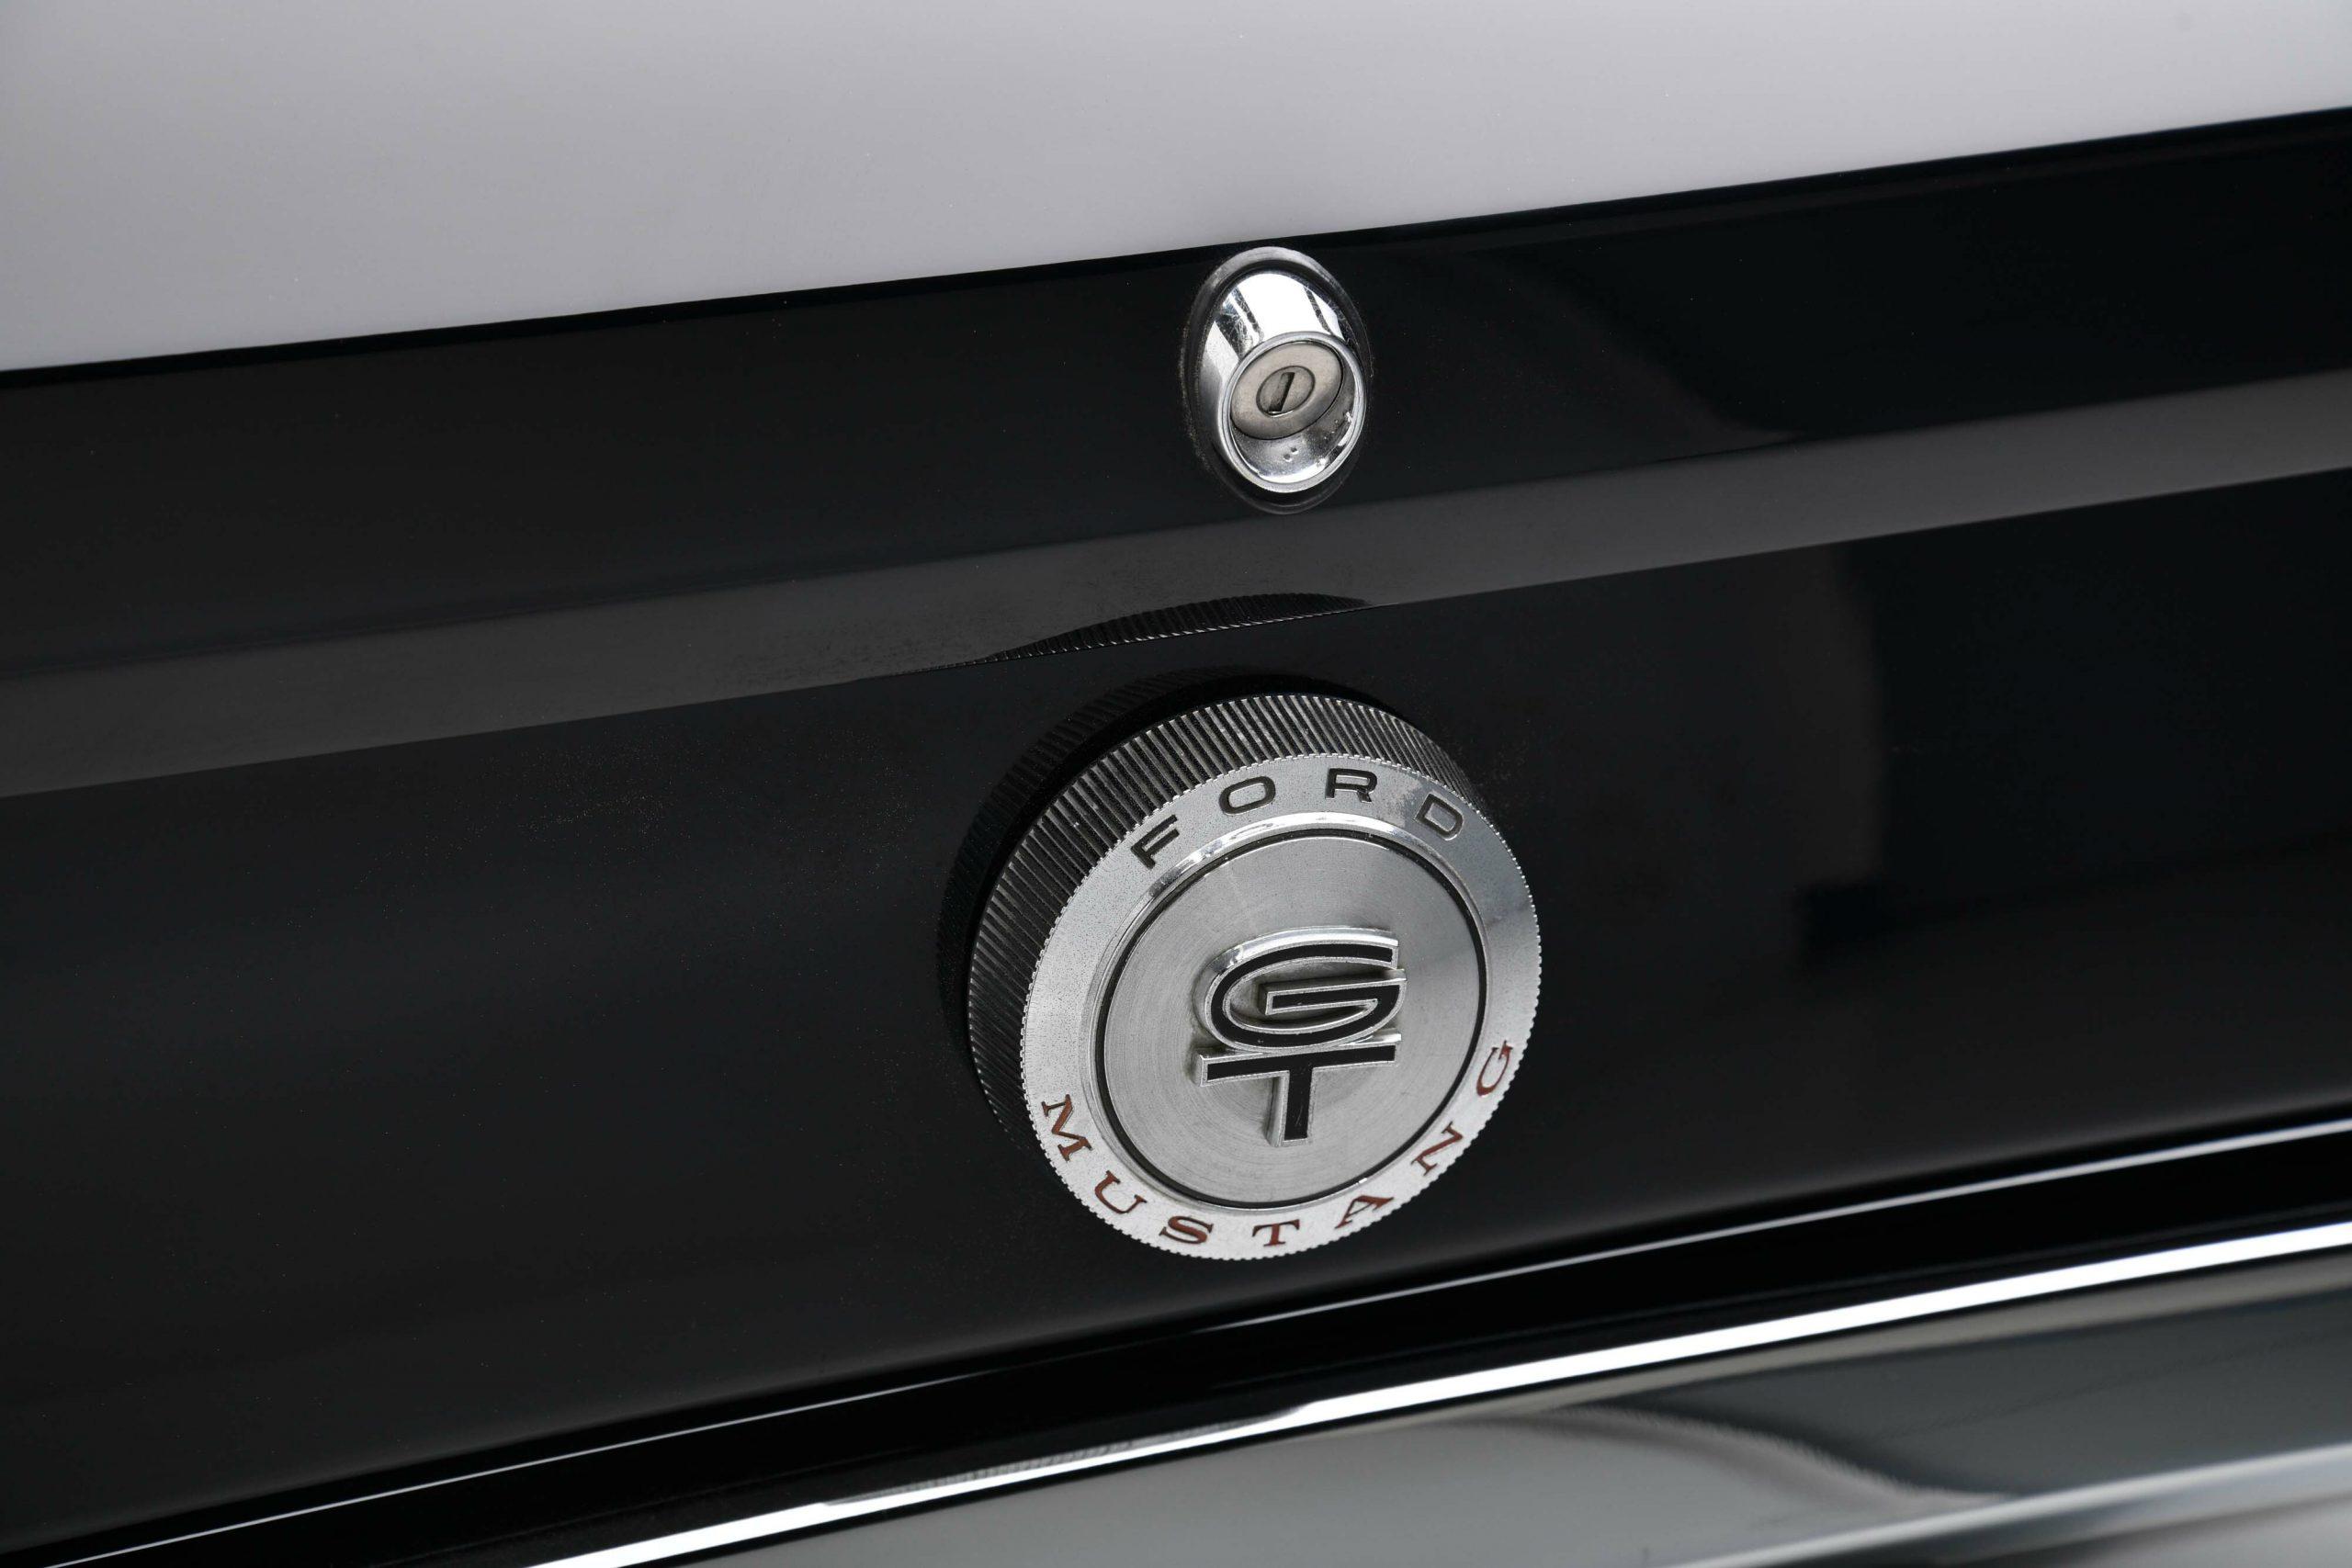 1966 FORD MUSTANG GT K-CODE CONVERTIBLE rear trunk detail